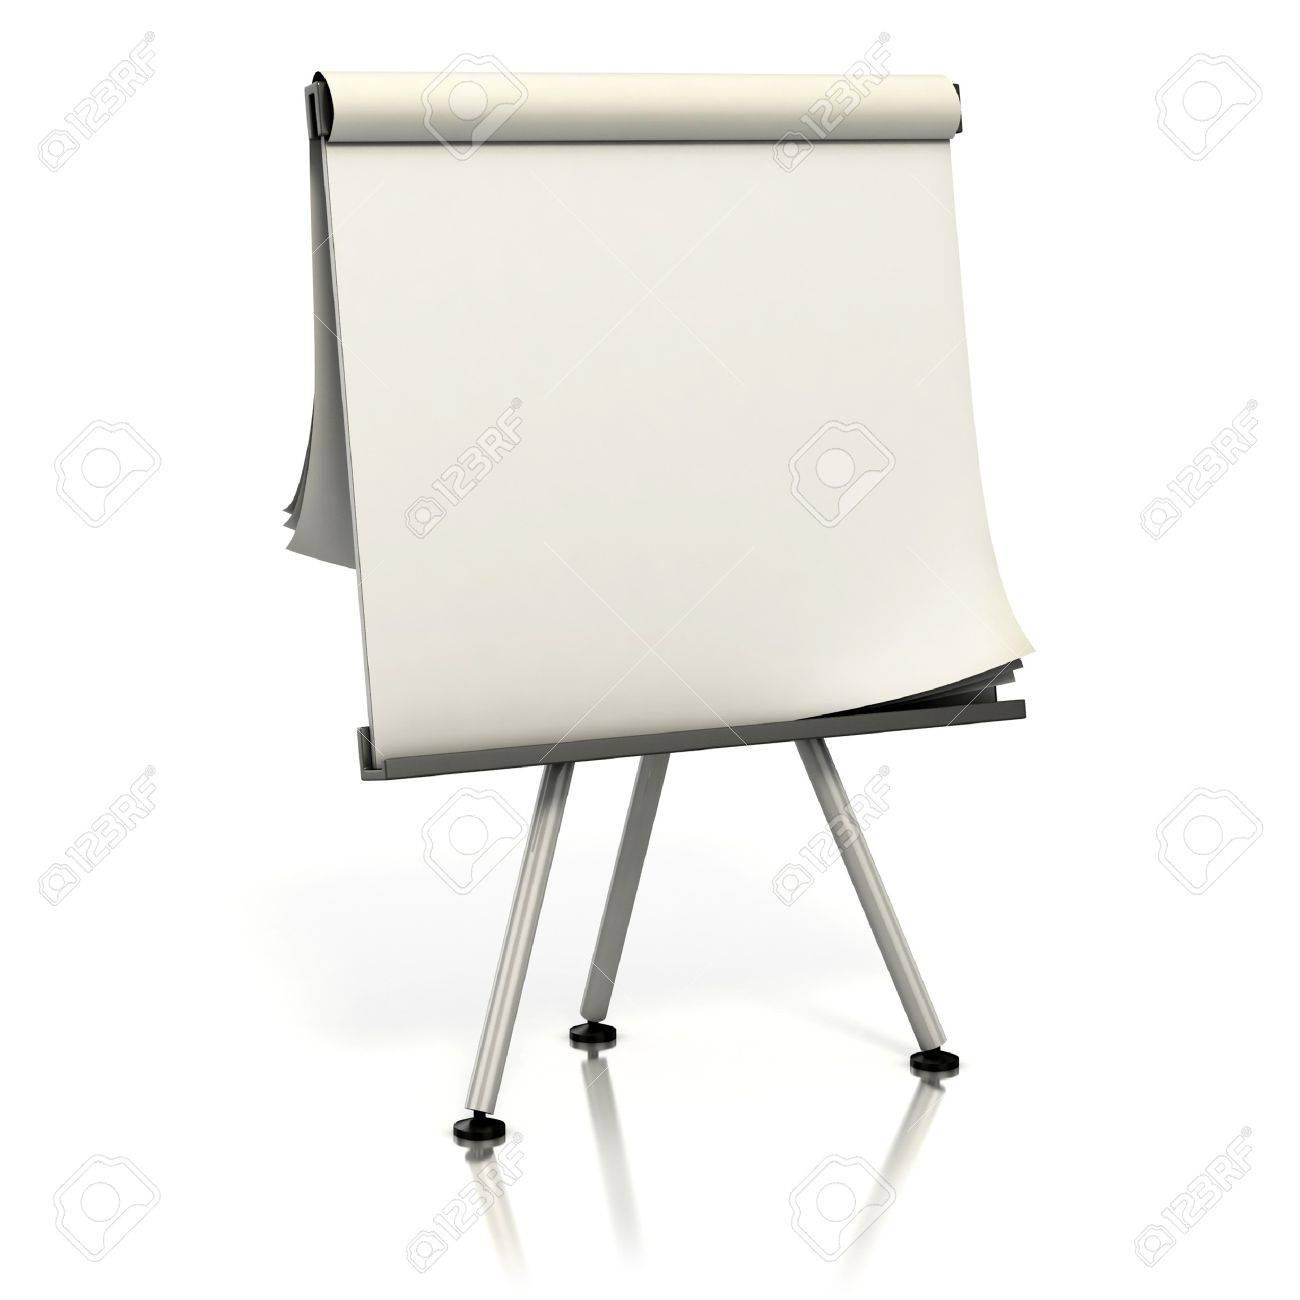 blank presentation board Stock Photo - 12331041